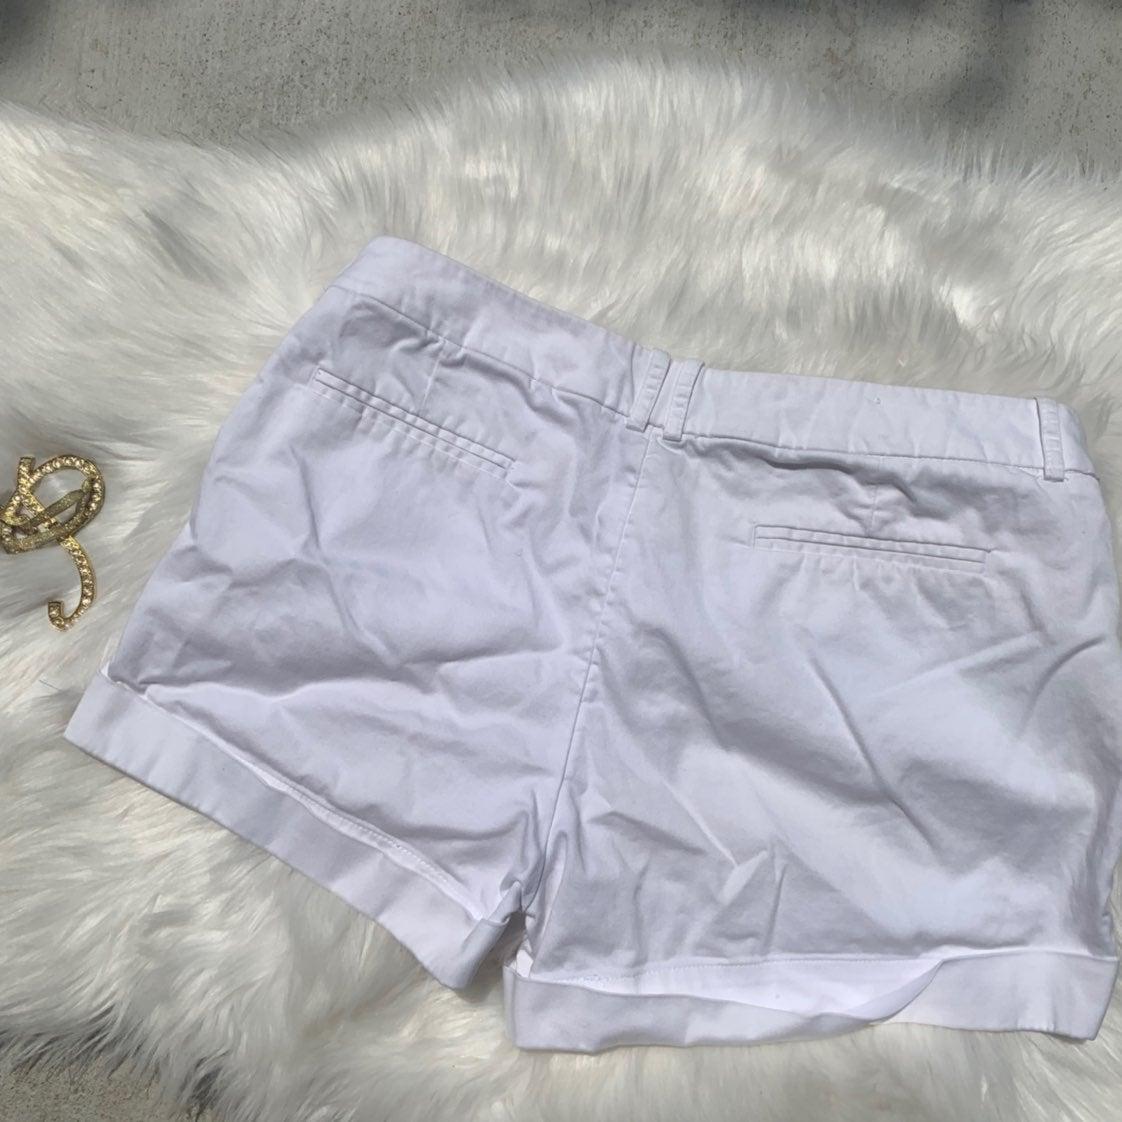 Massimo white Shorts